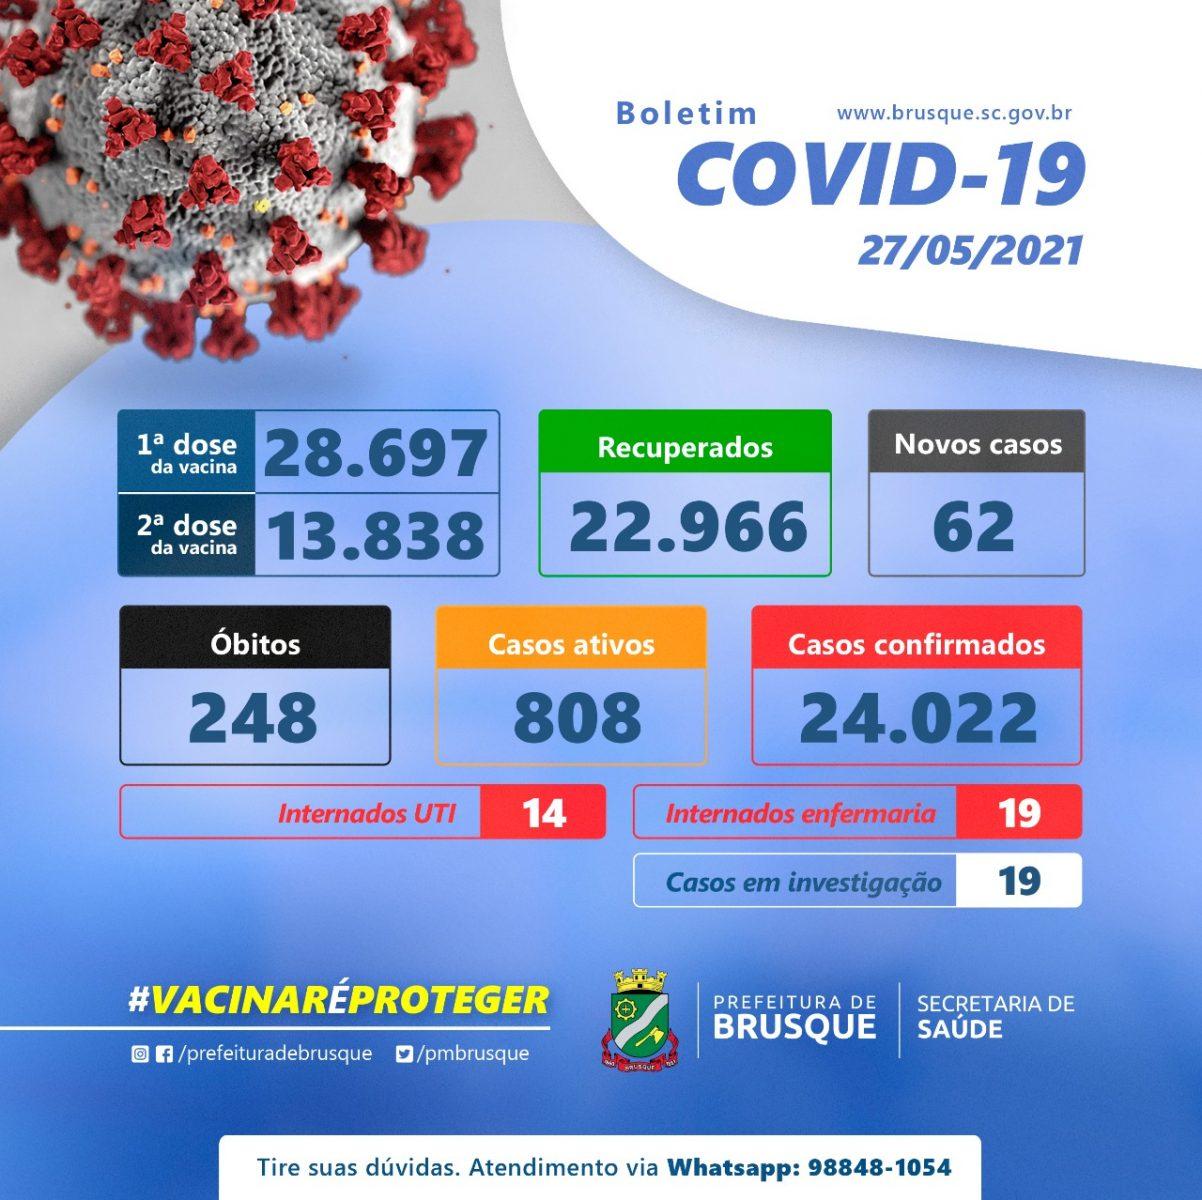 Covid-19: Confira o boletim epidemiológico desta quinta-feira (27)